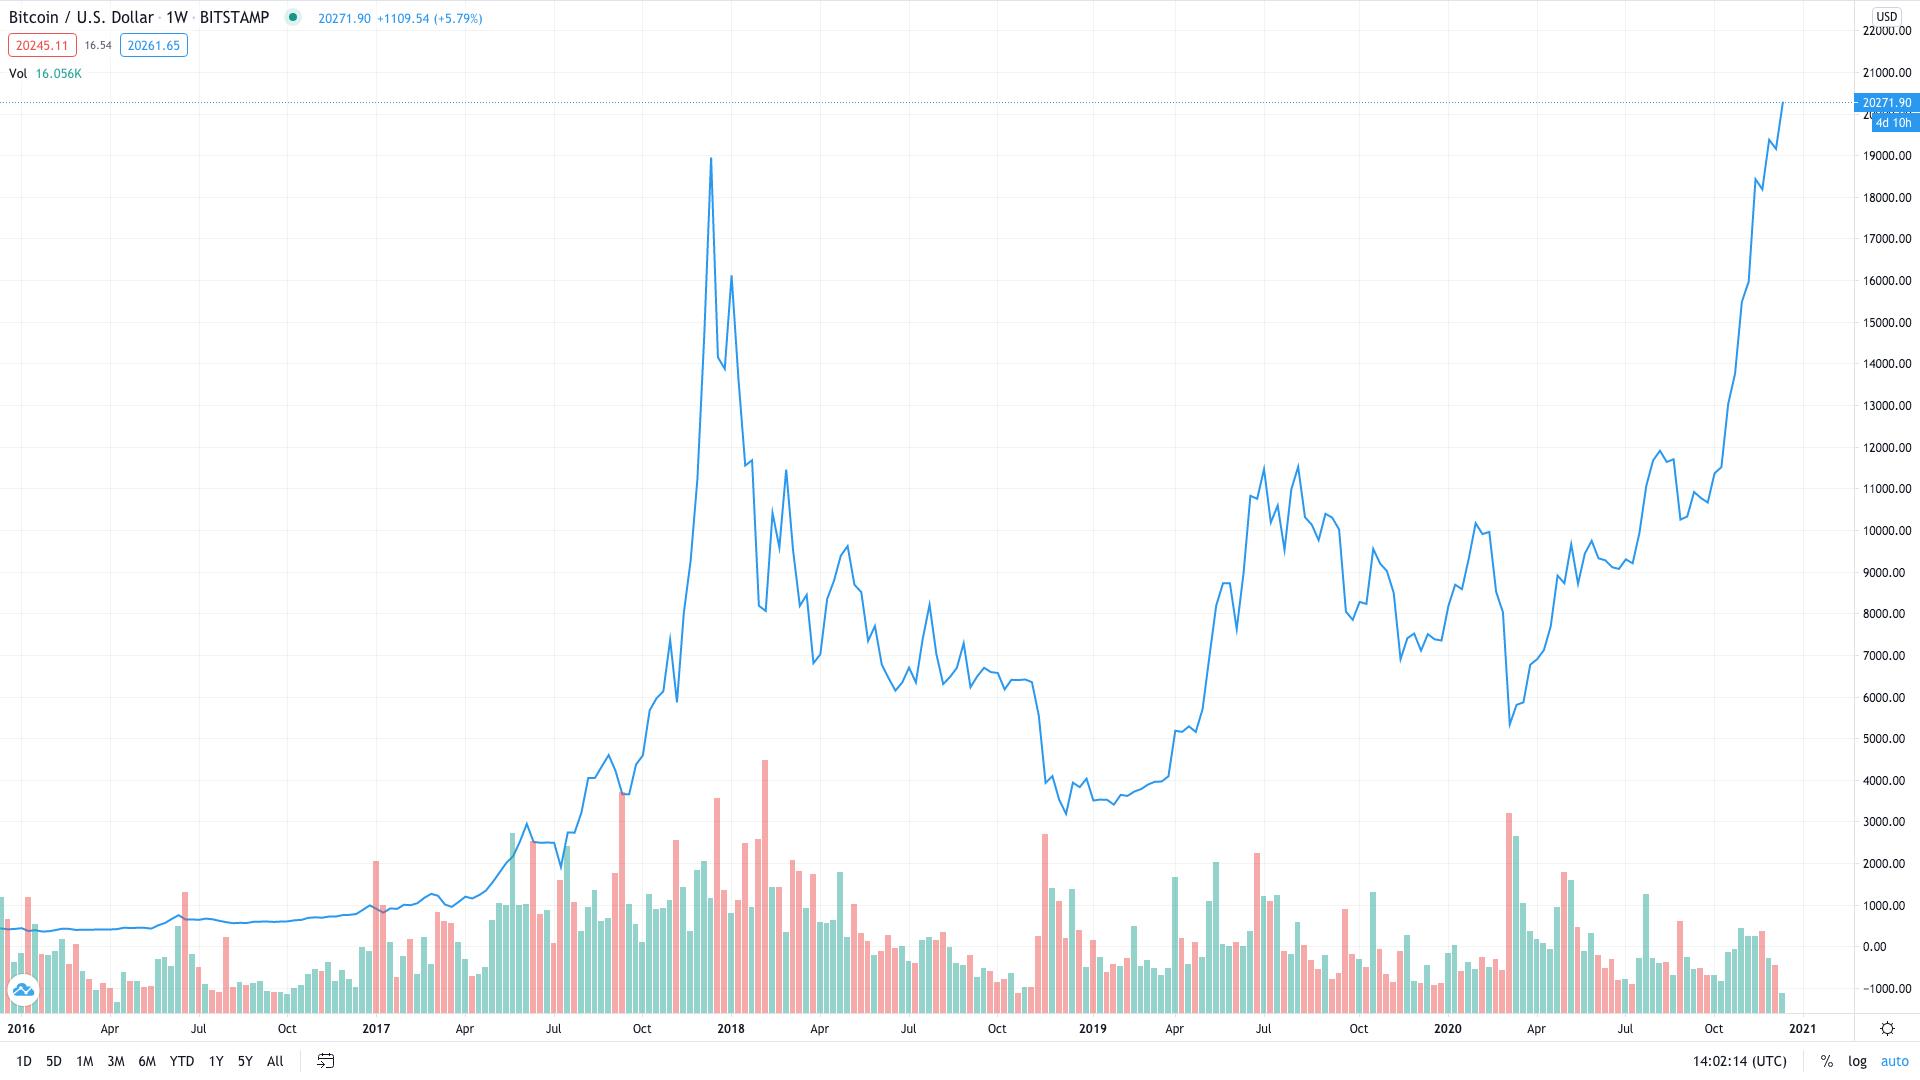 Bitcoin Price Action